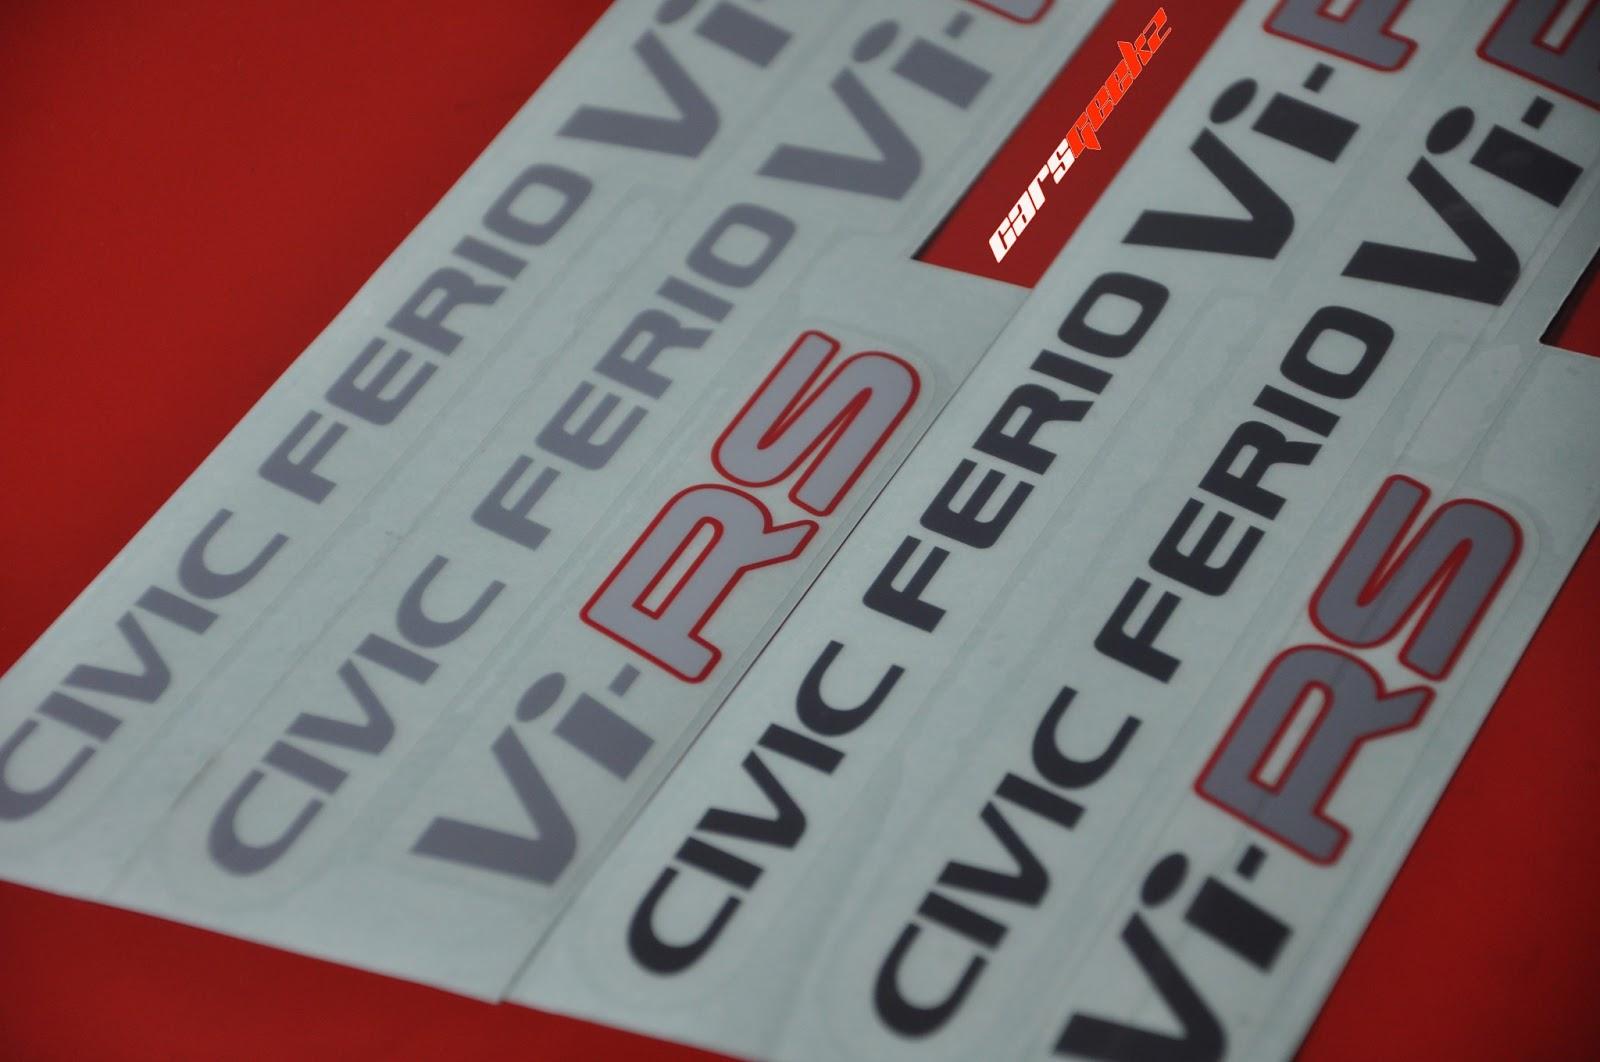 ViRS - civic ferio decals stickers 1